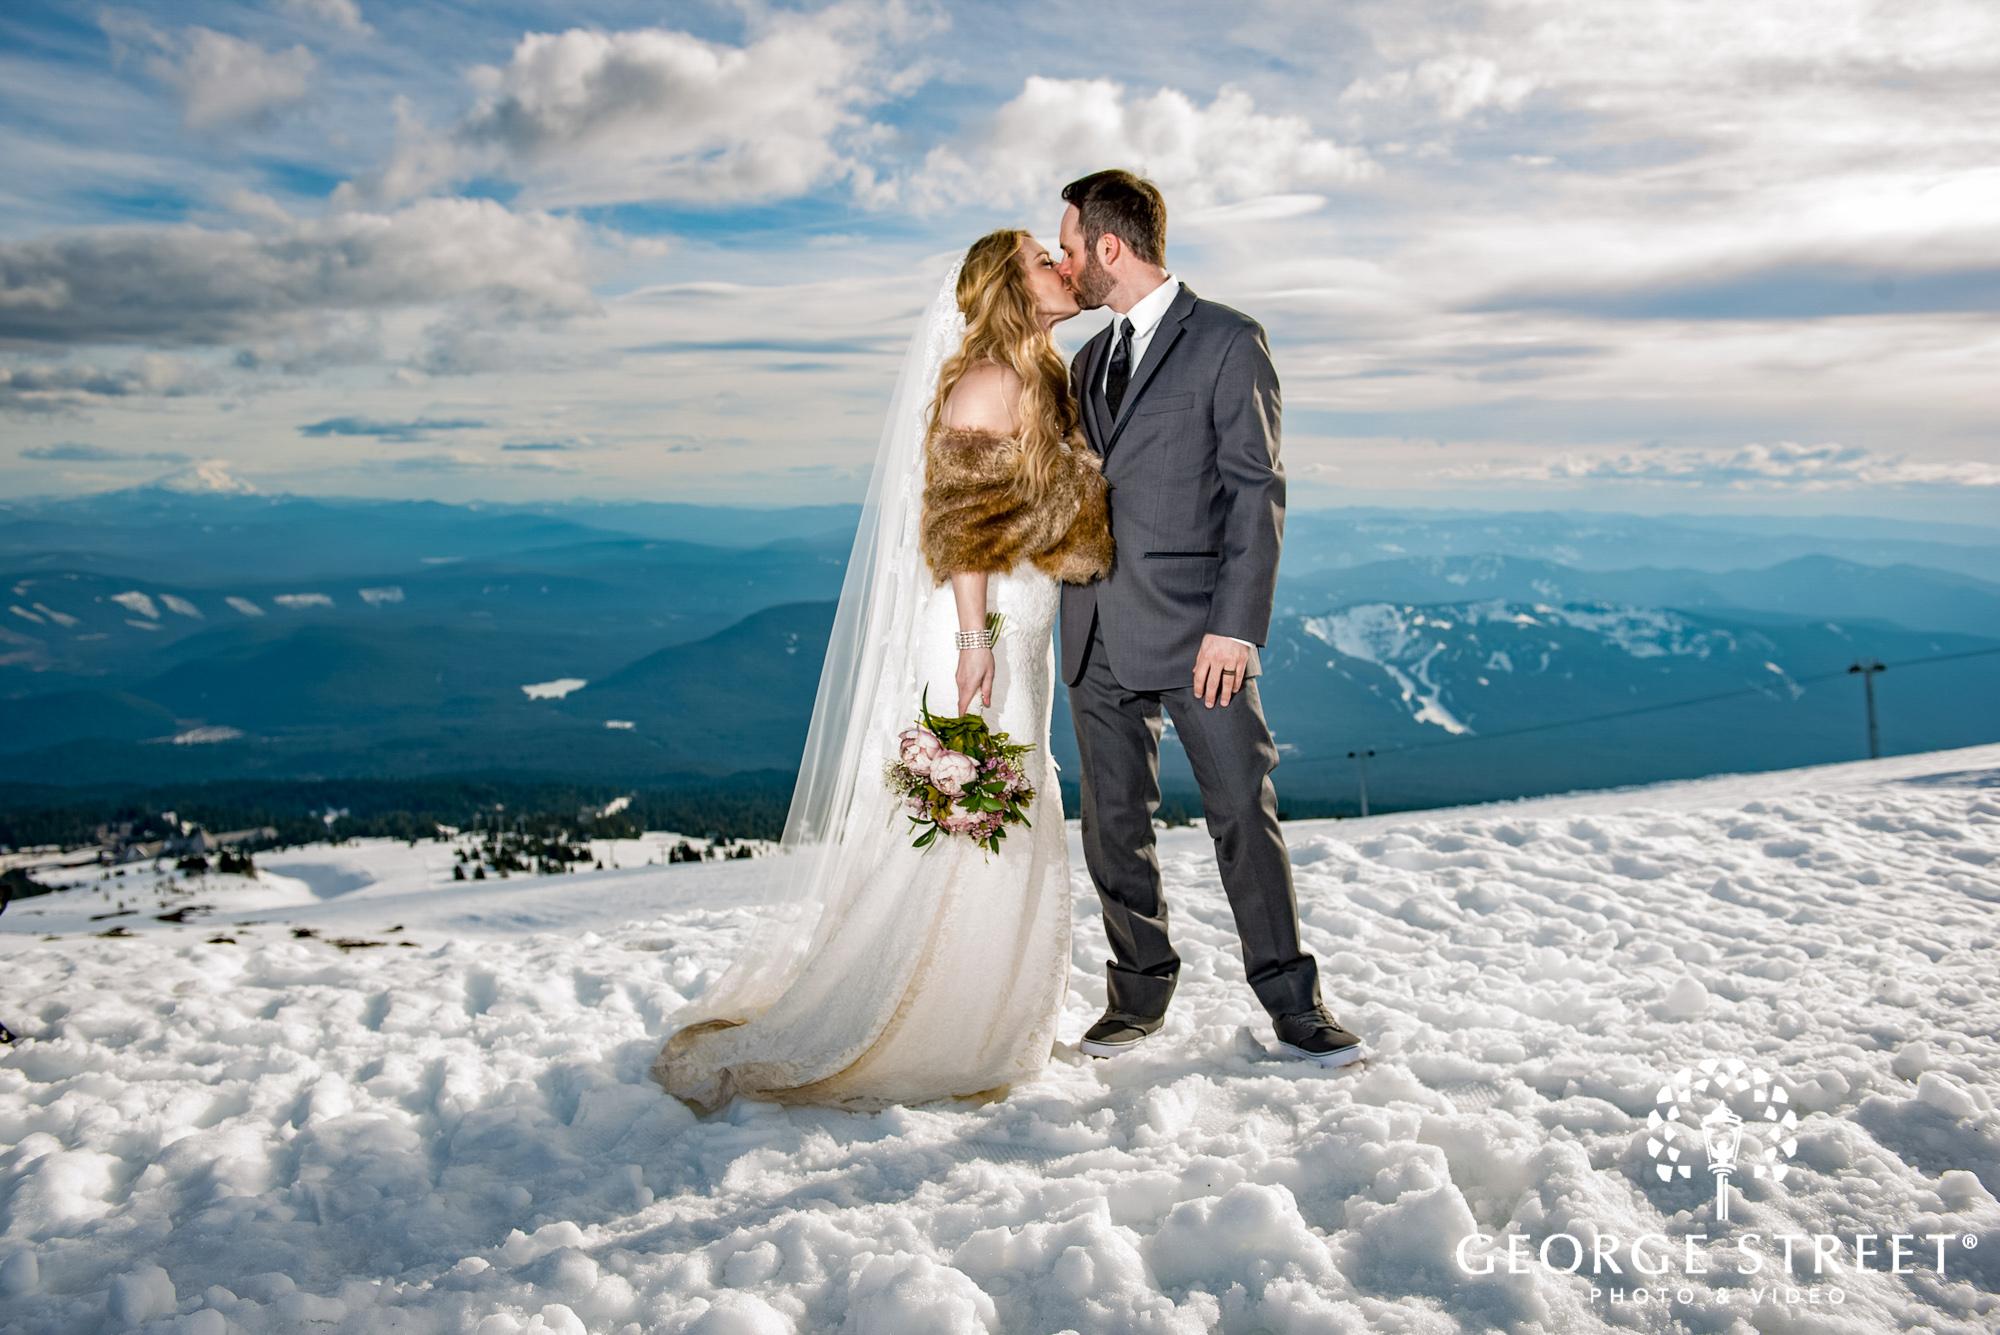 Wedding Inspiration for Any Season